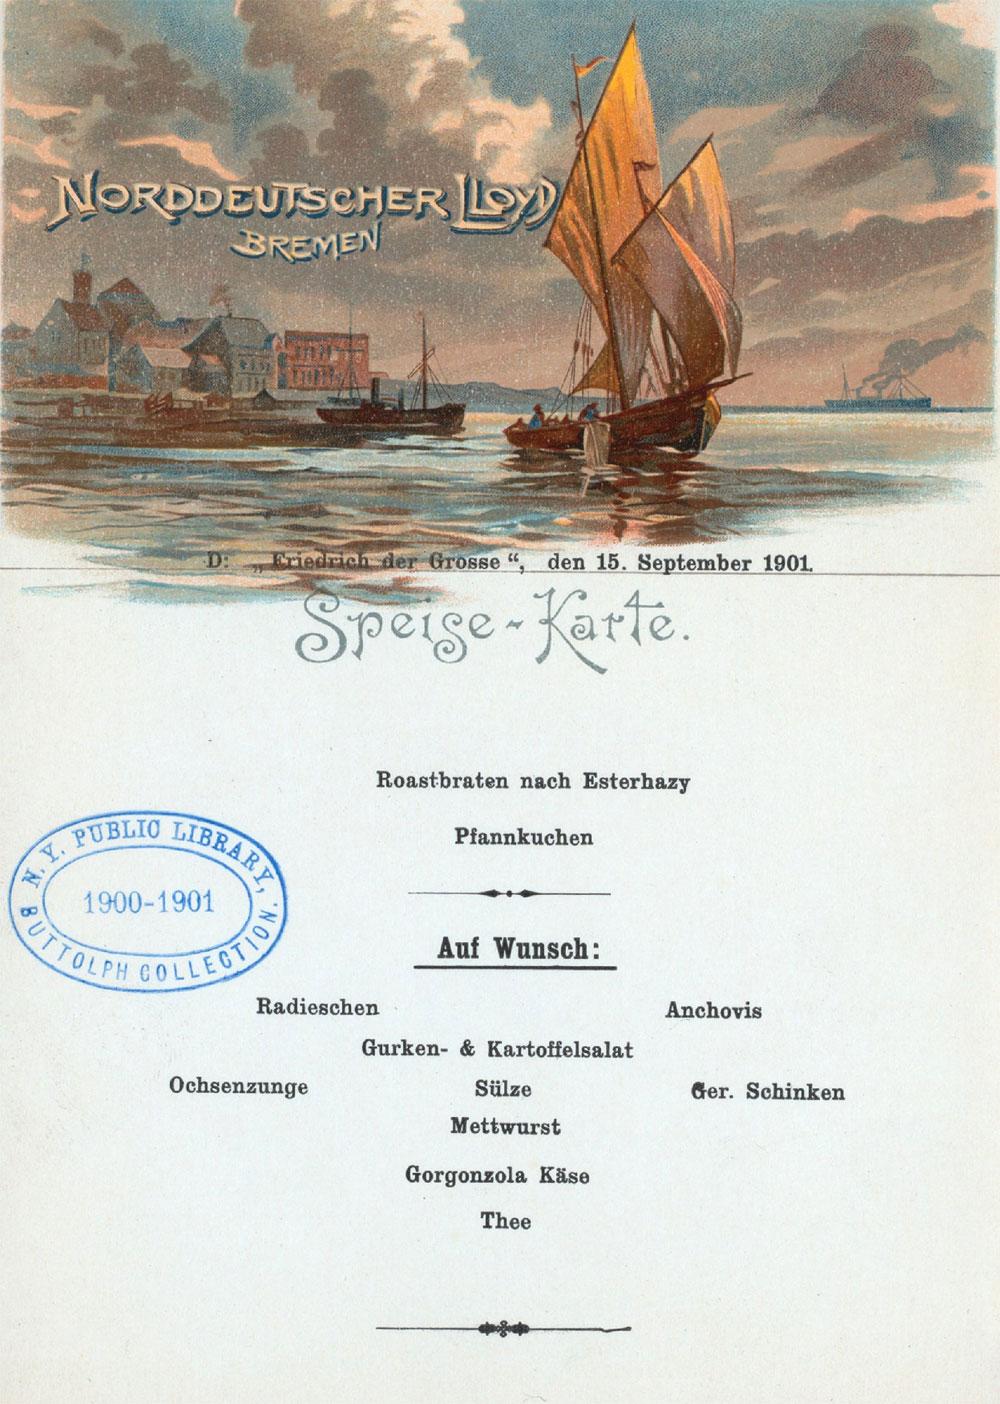 friedrich-1901